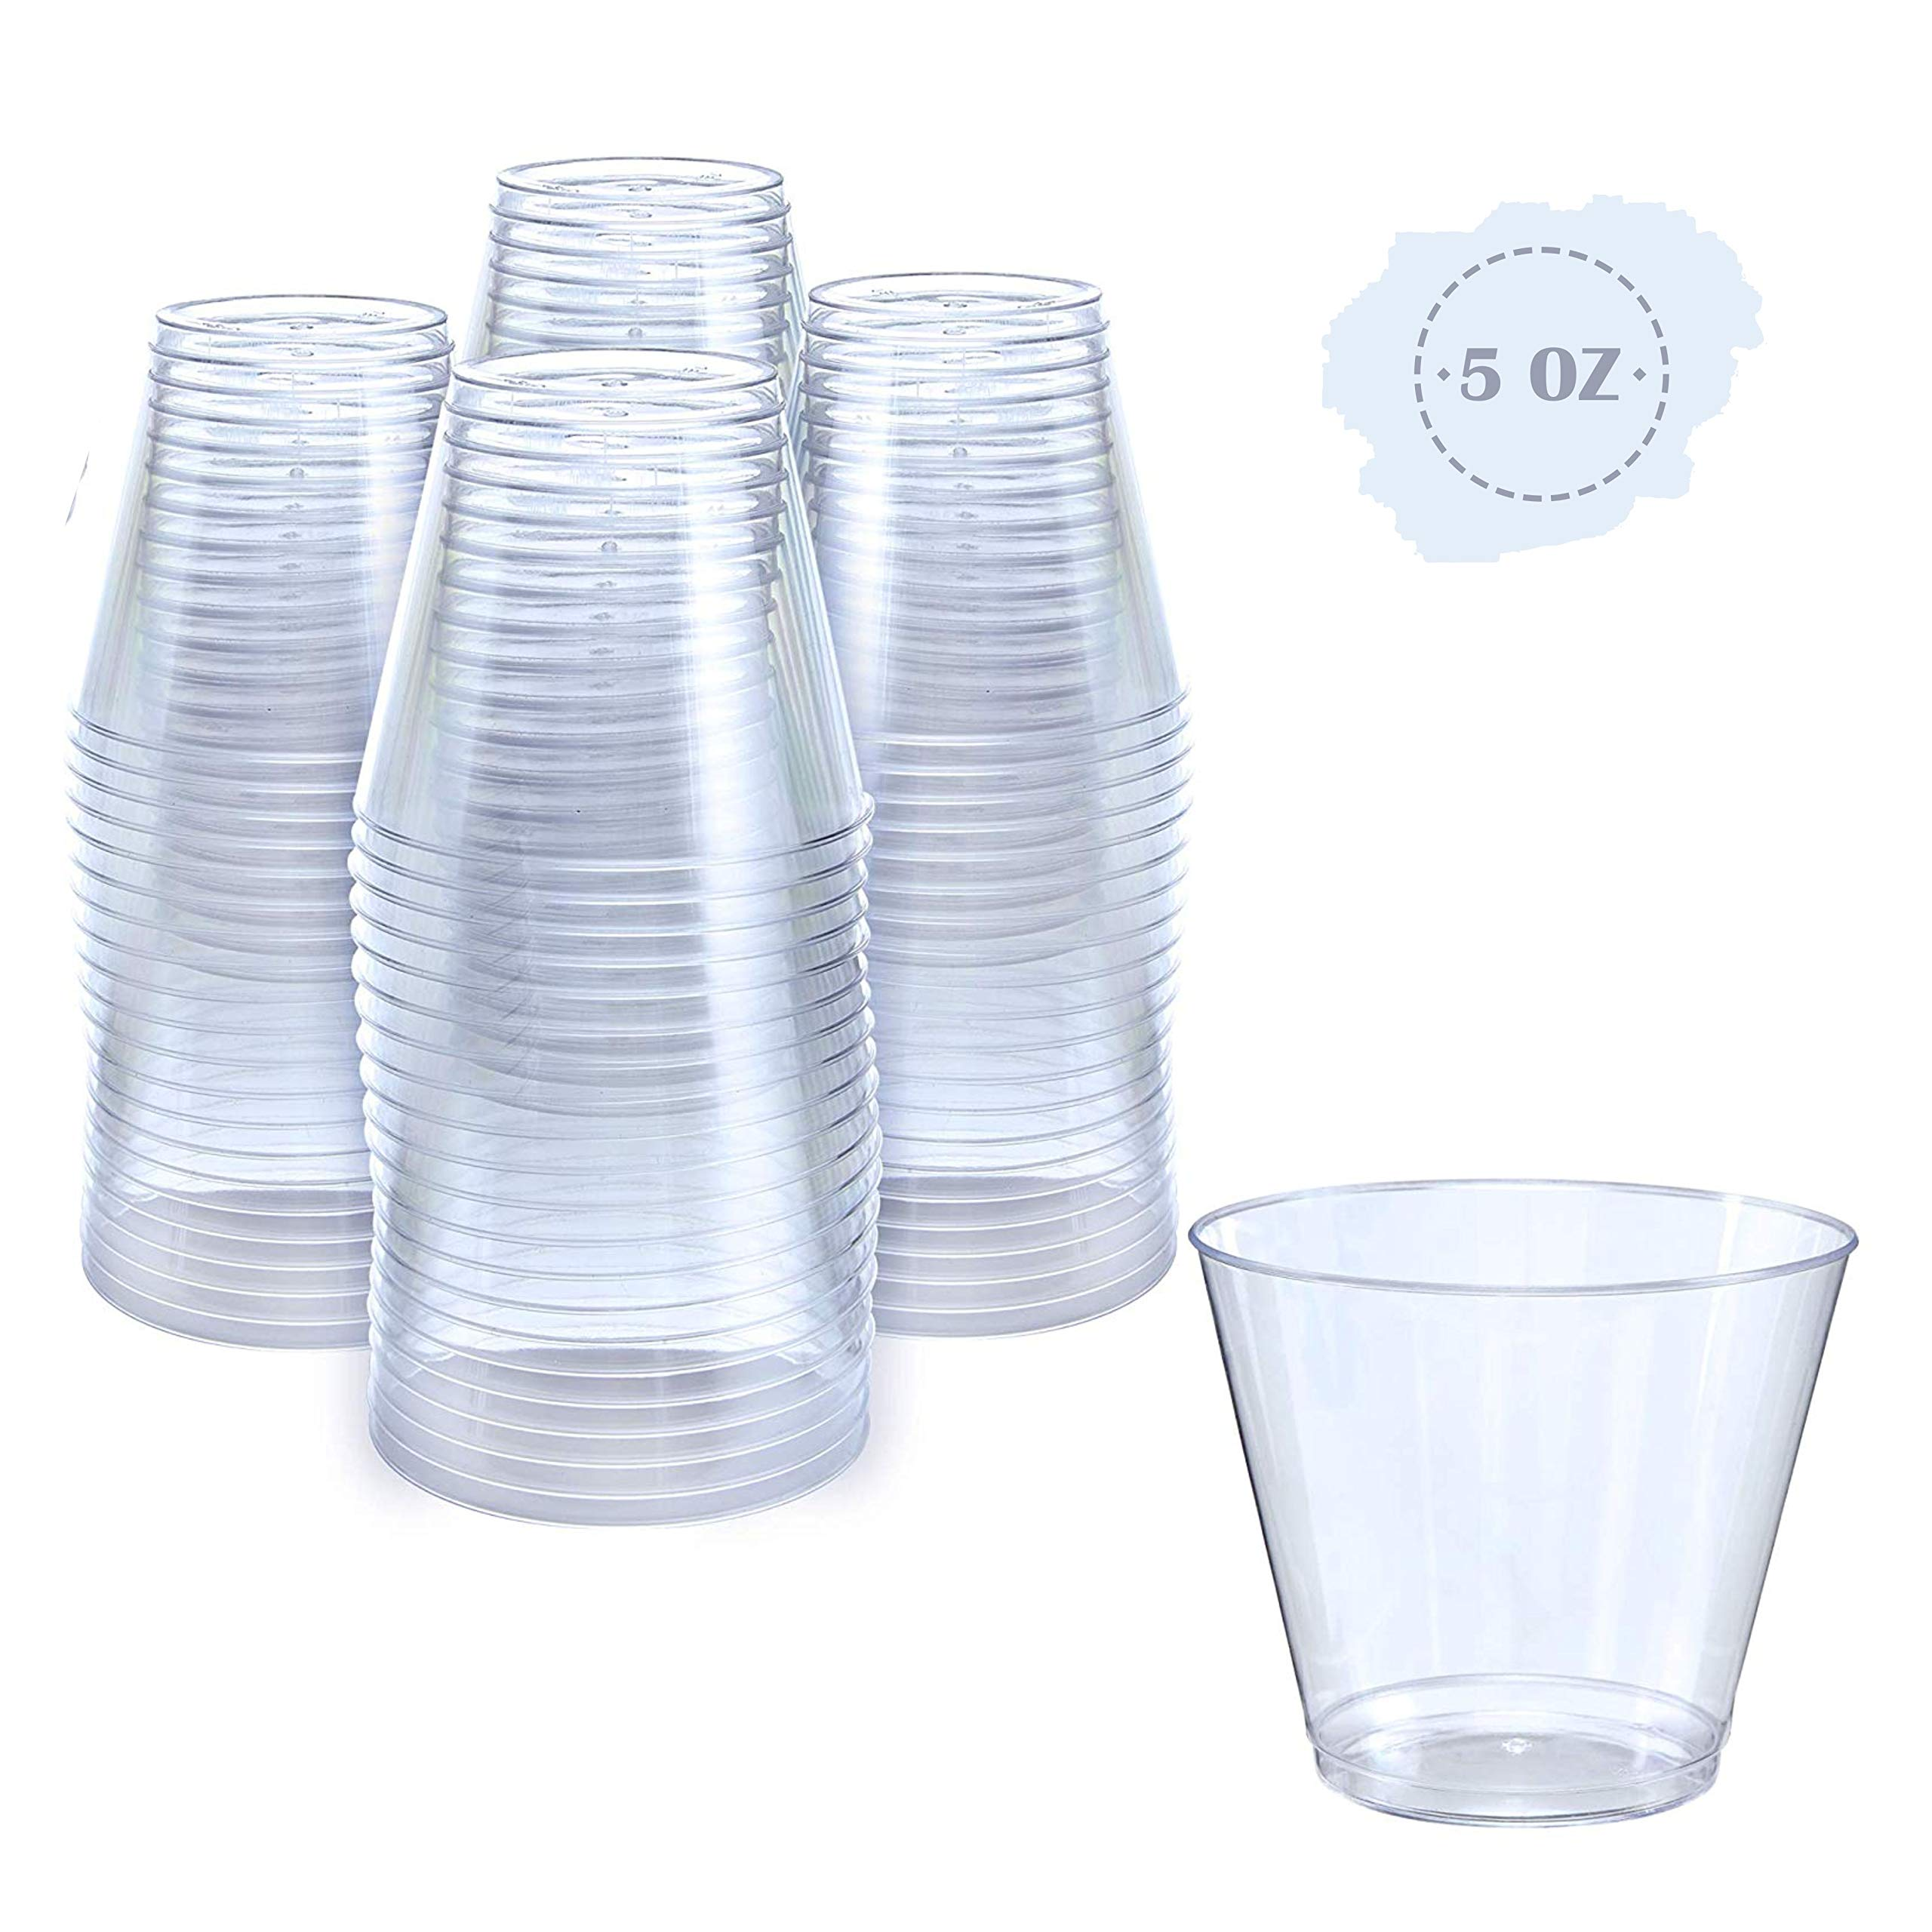 Small Clear Plastic Cups   5 oz. 100 Pack   Hard Disposable Cups   Plastic Wine Cups   Plastic Cocktail Glasses   Plastic Drinking Cups   Plastic Party Punch Cups   Bulk Wedding Plastic Tumblers